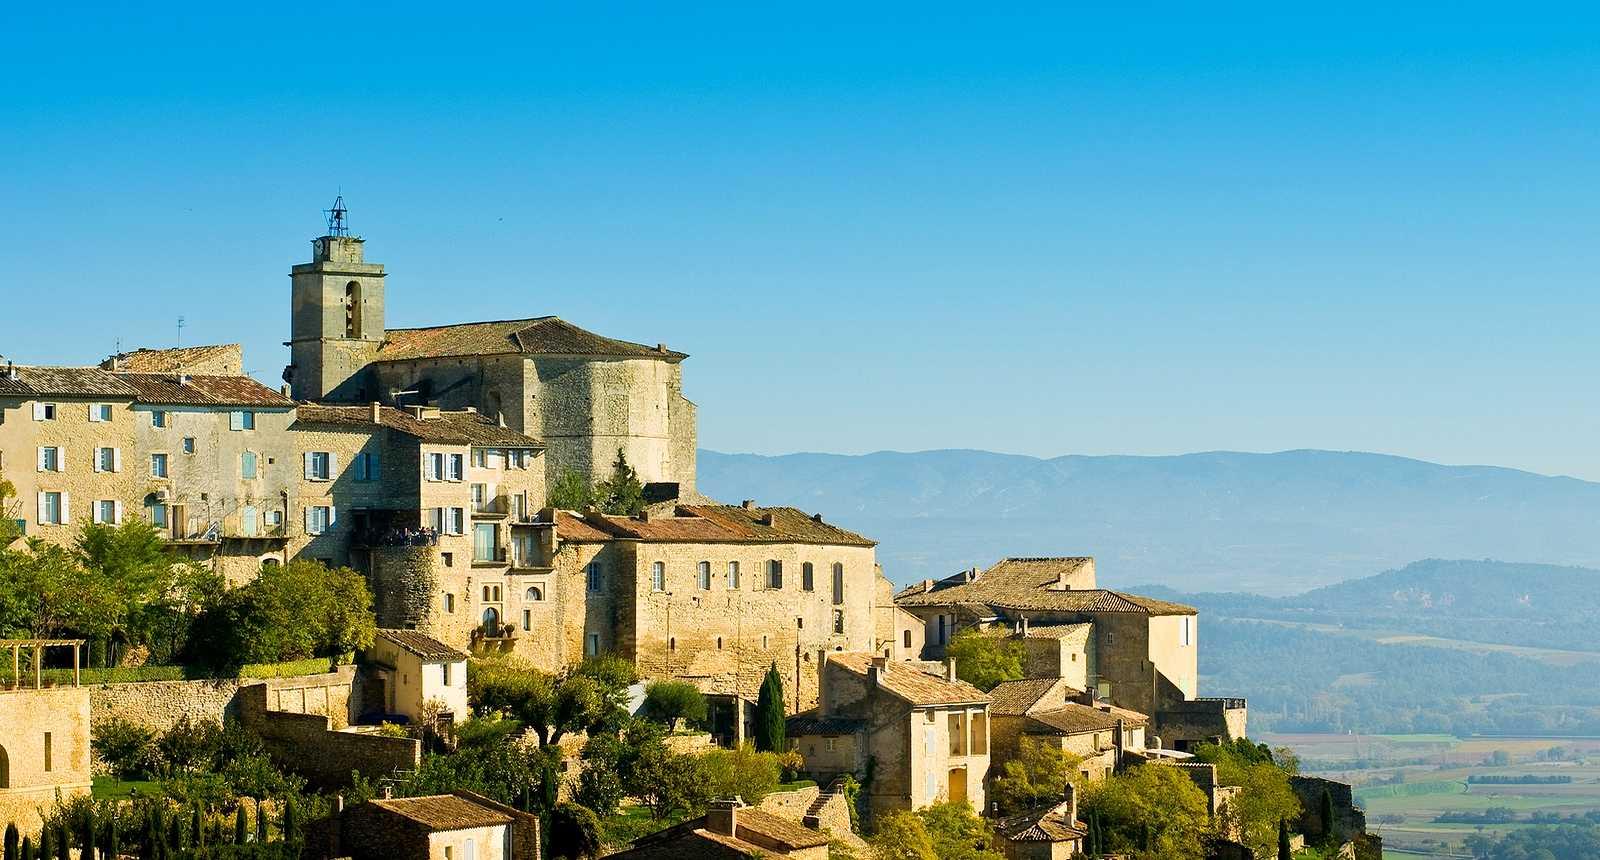 Eglise Saint-Firmin, Village de Gordes, Luberon